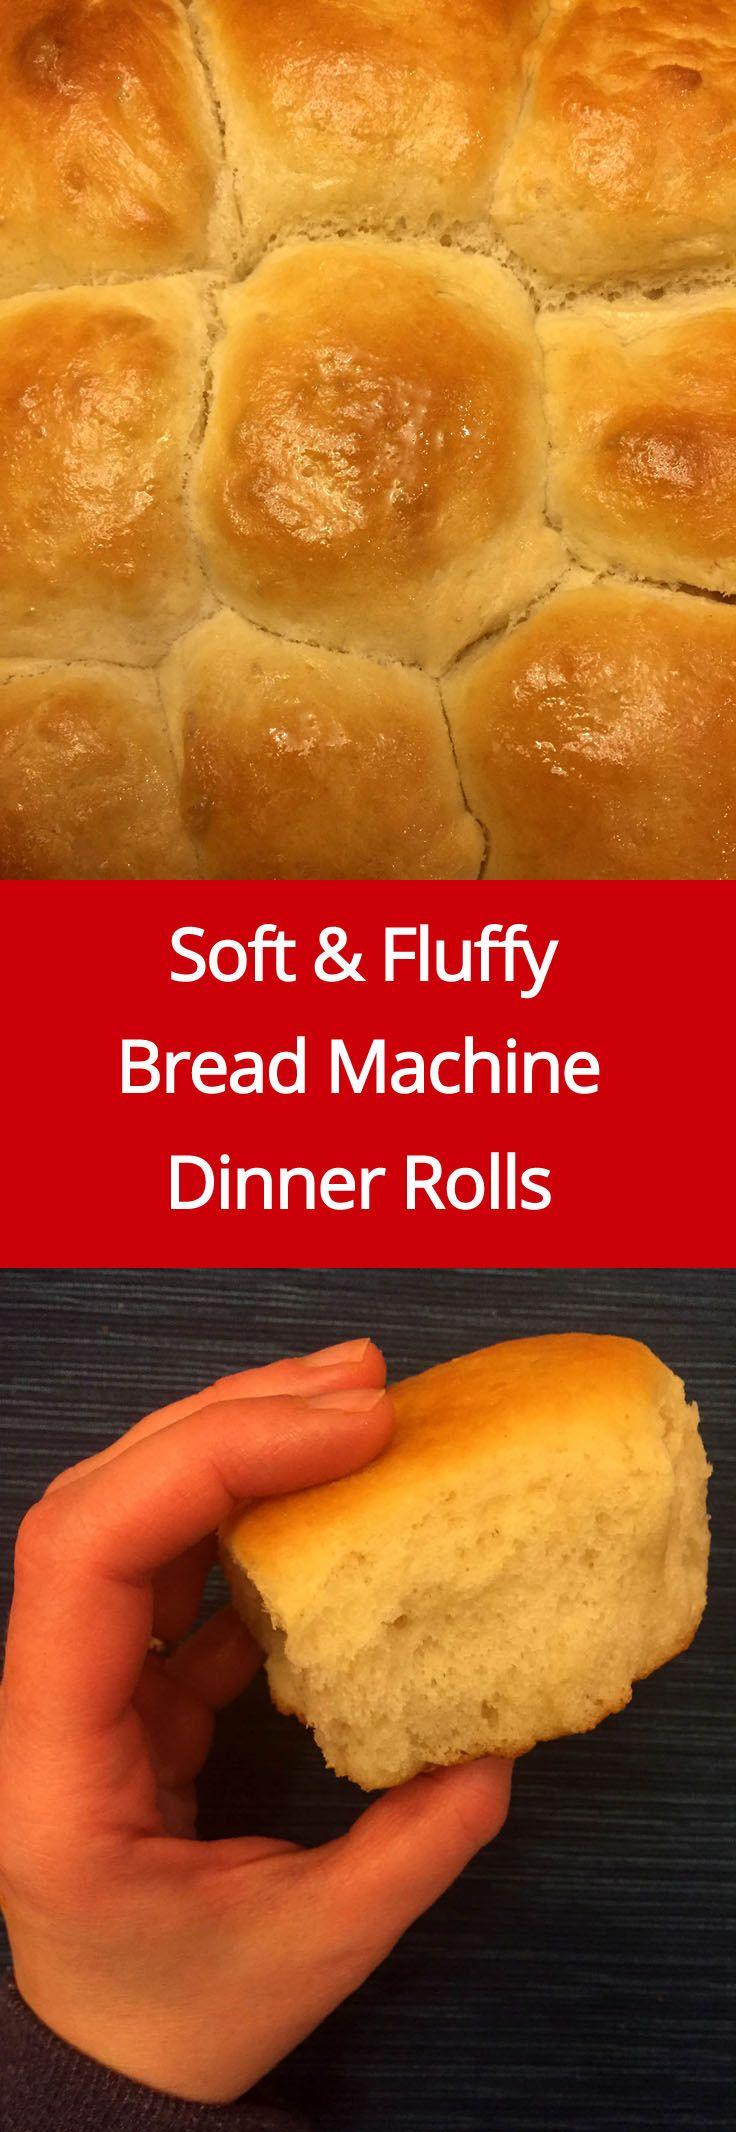 Easy Soft Bread Machine Dinner Rolls Recipe